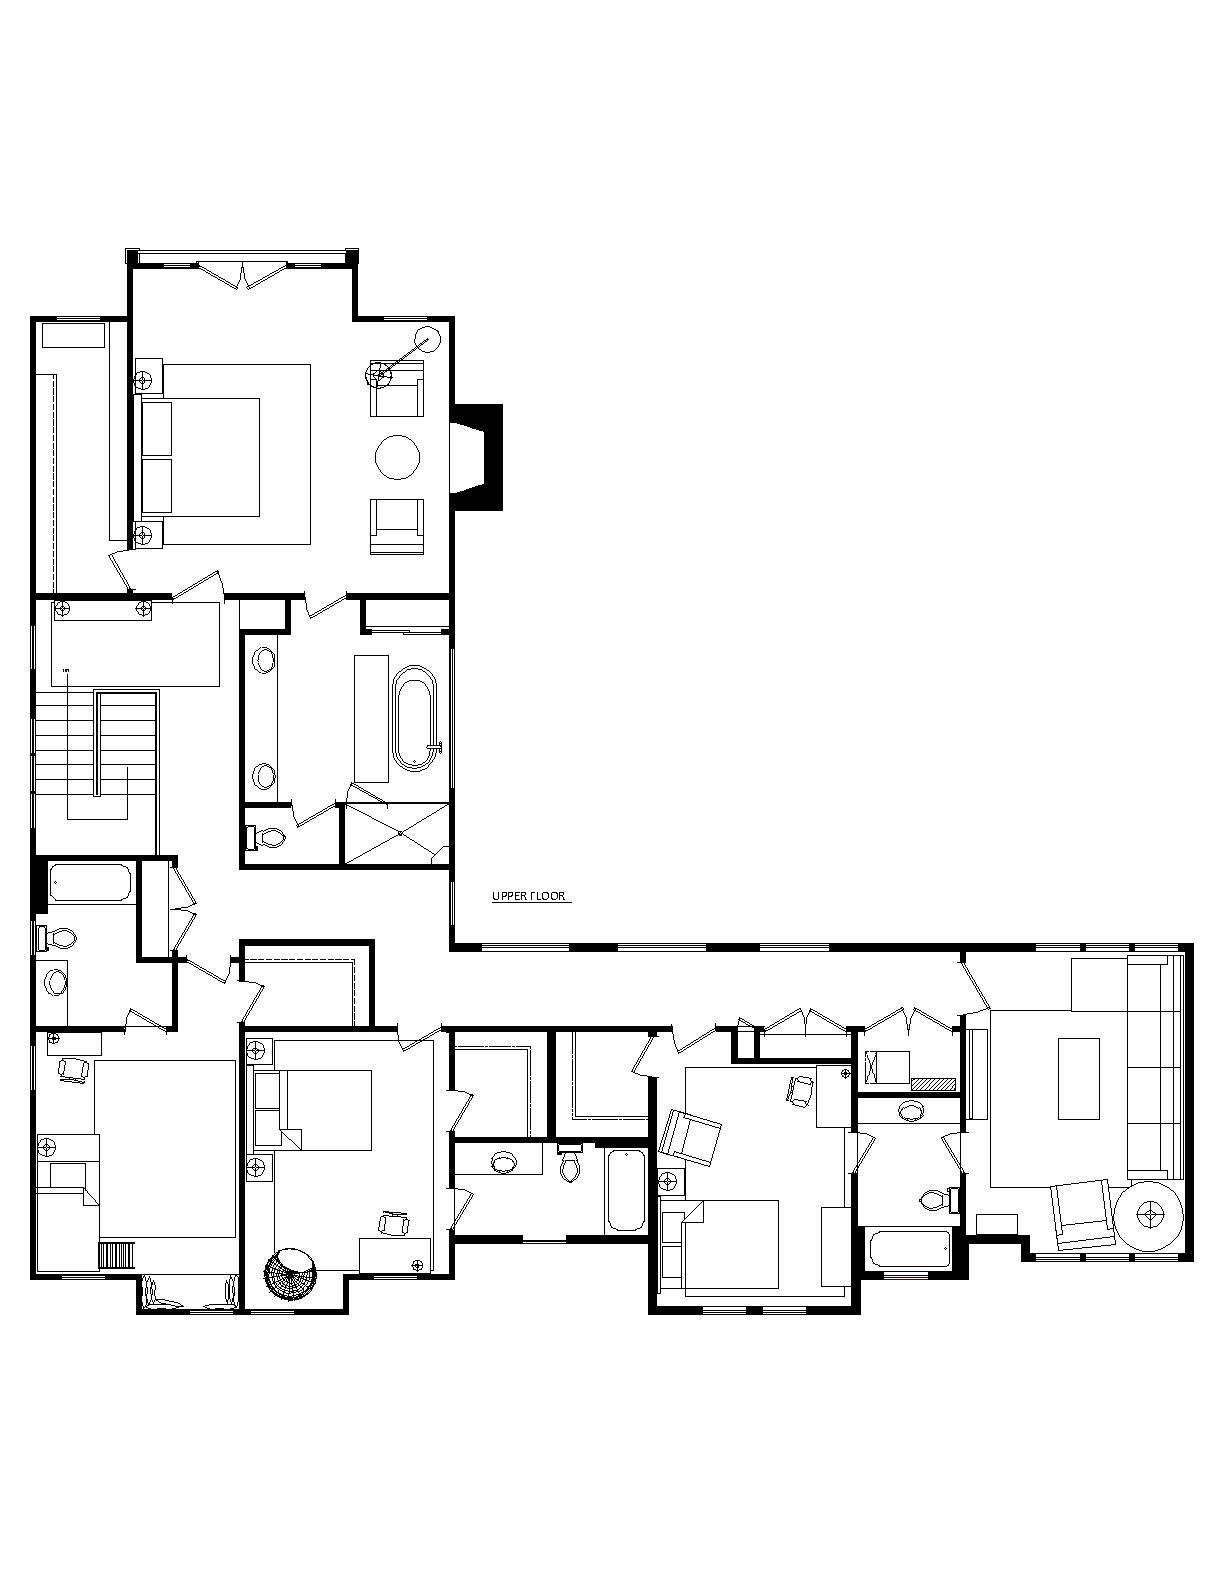 floor plan, second floor of a remodeled ralph anderson 1966 home in bellevue, w 26